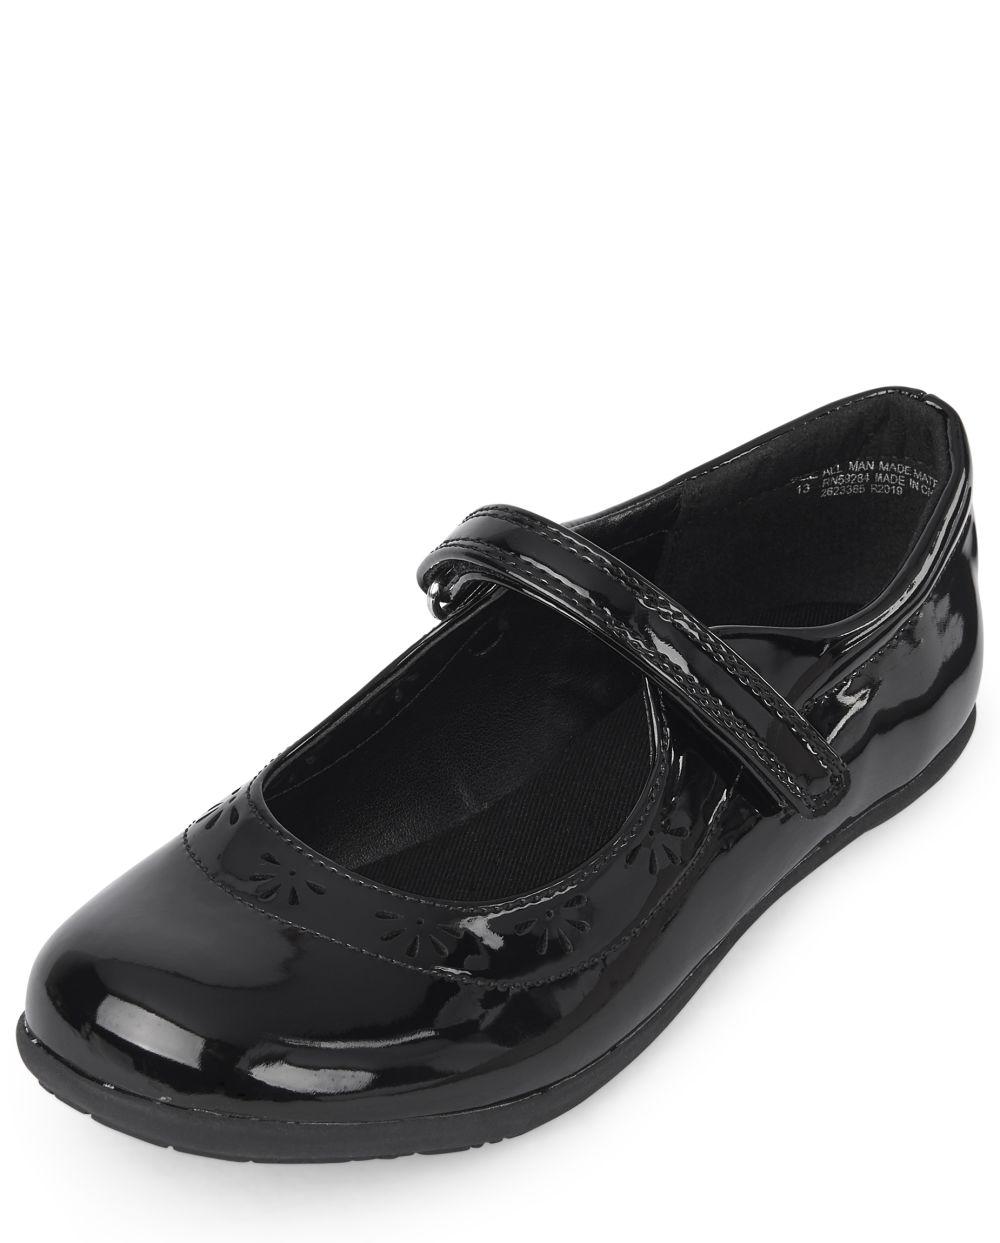 Girls Uniform Flower Shoes